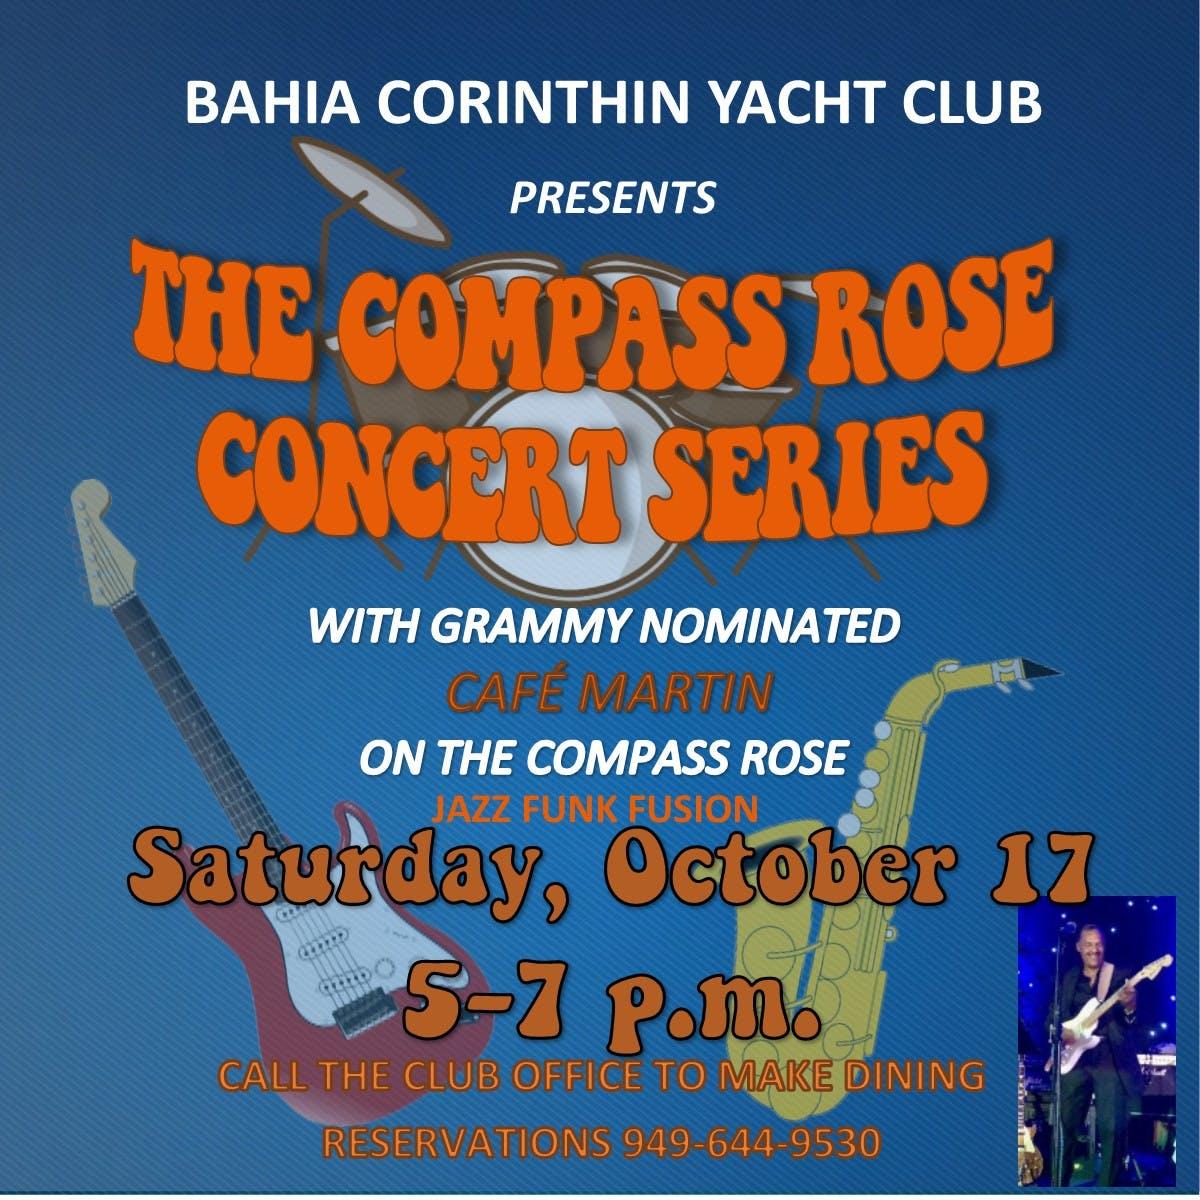 Compass Rose Concert Series